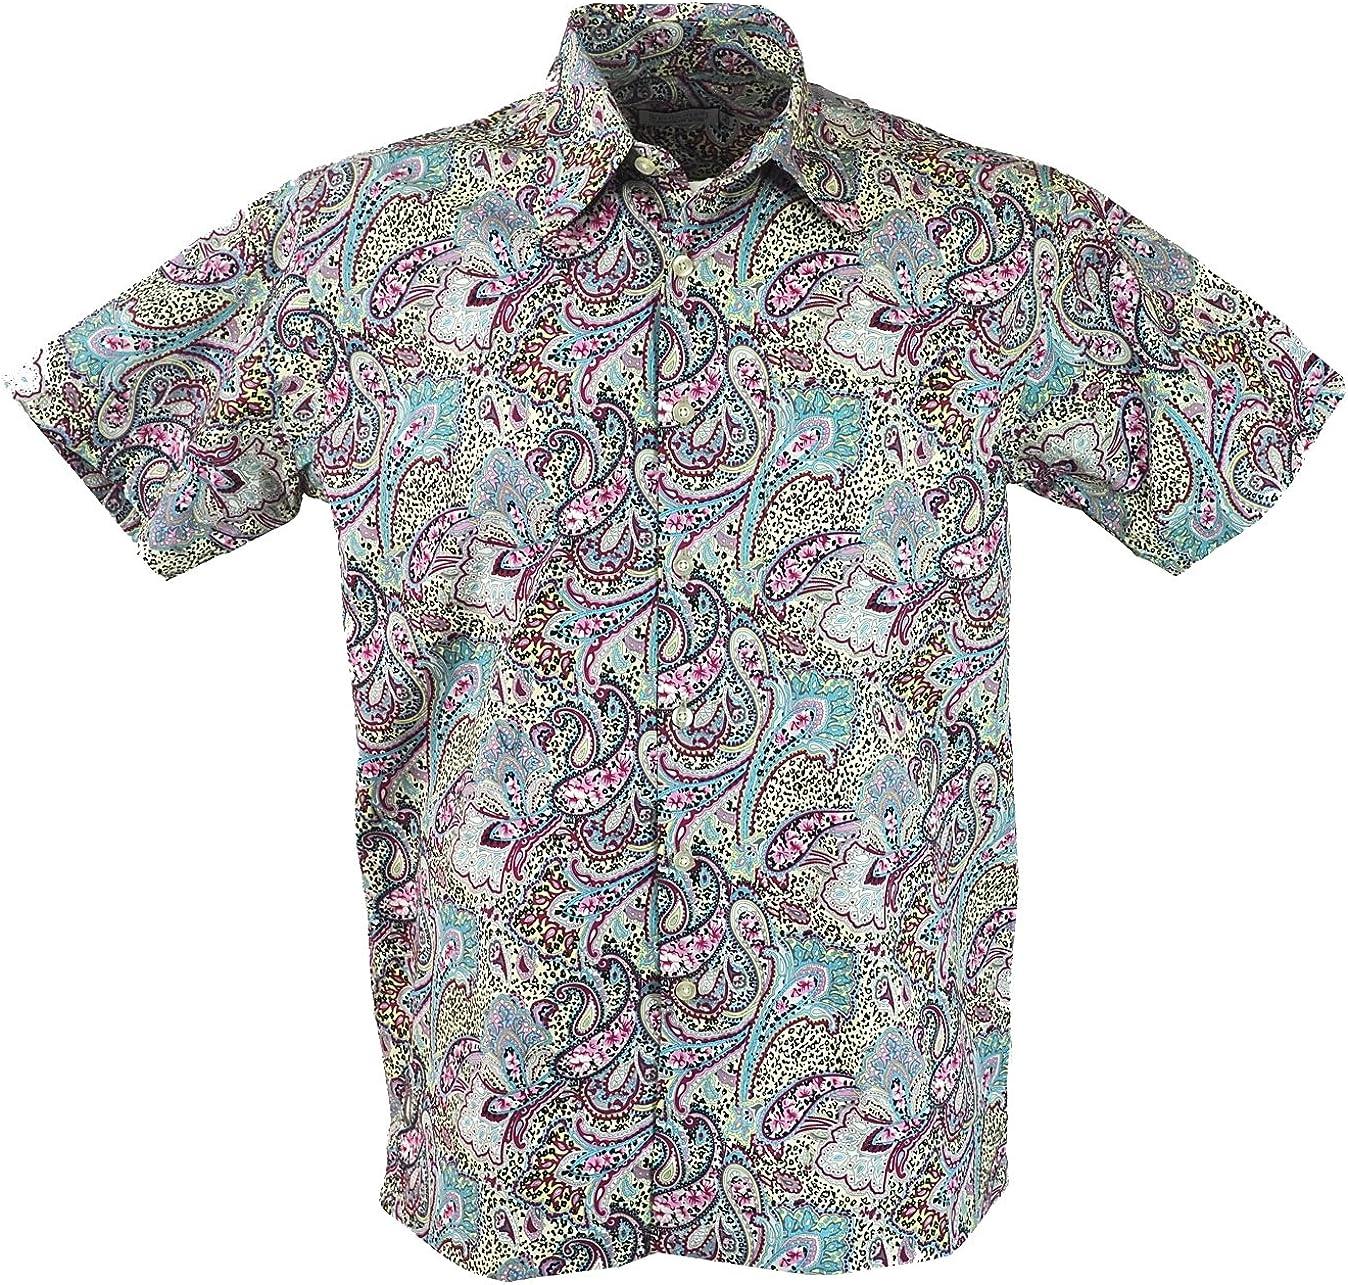 GURU-SHOP, Camisa Hawai, Camisa Hippie, Camisa, Paisley Azul ...